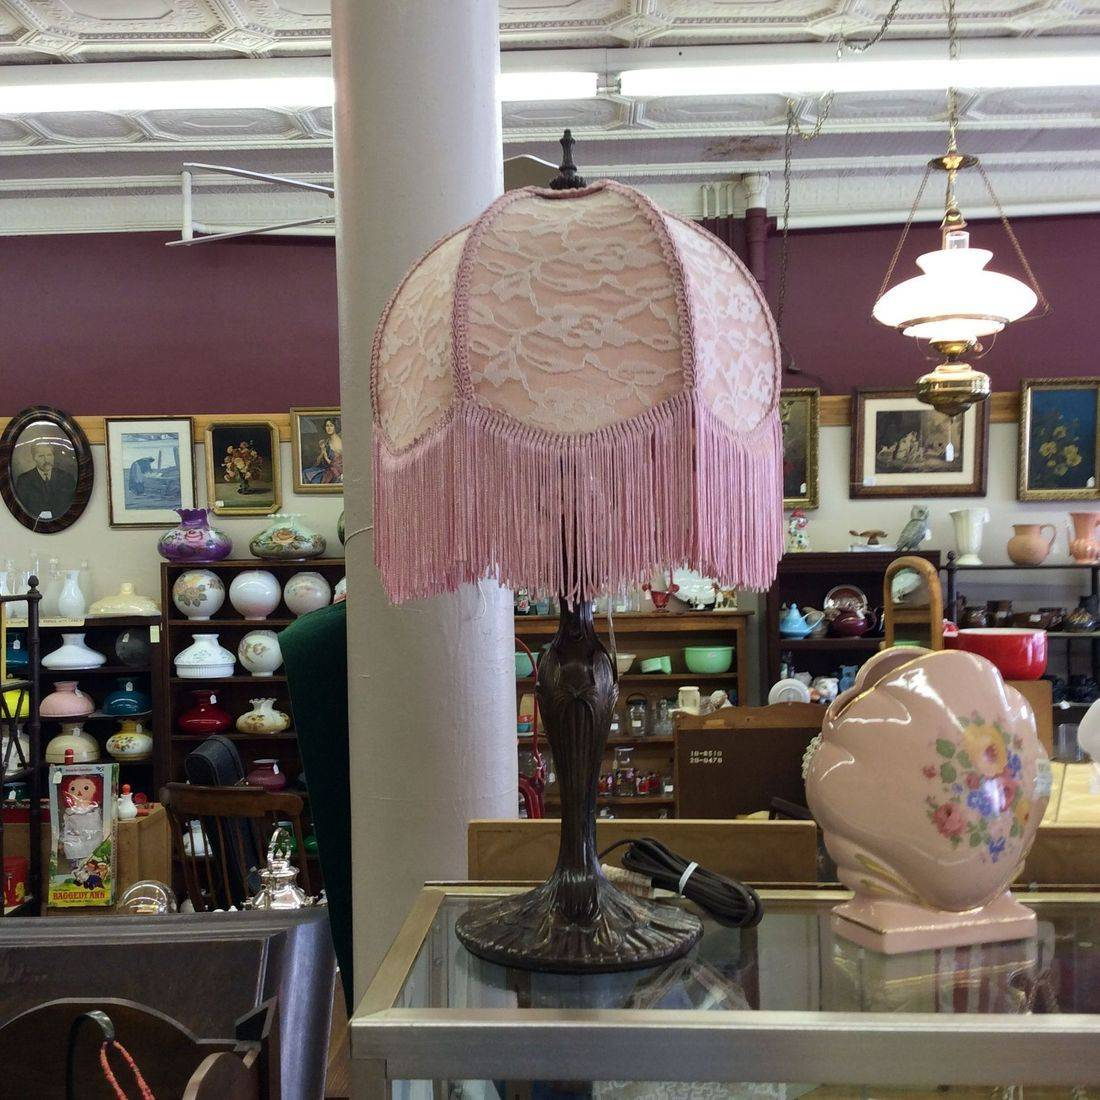 "21"" Antique Style Metal Lamp w/Tasseled Shade   $75.00"